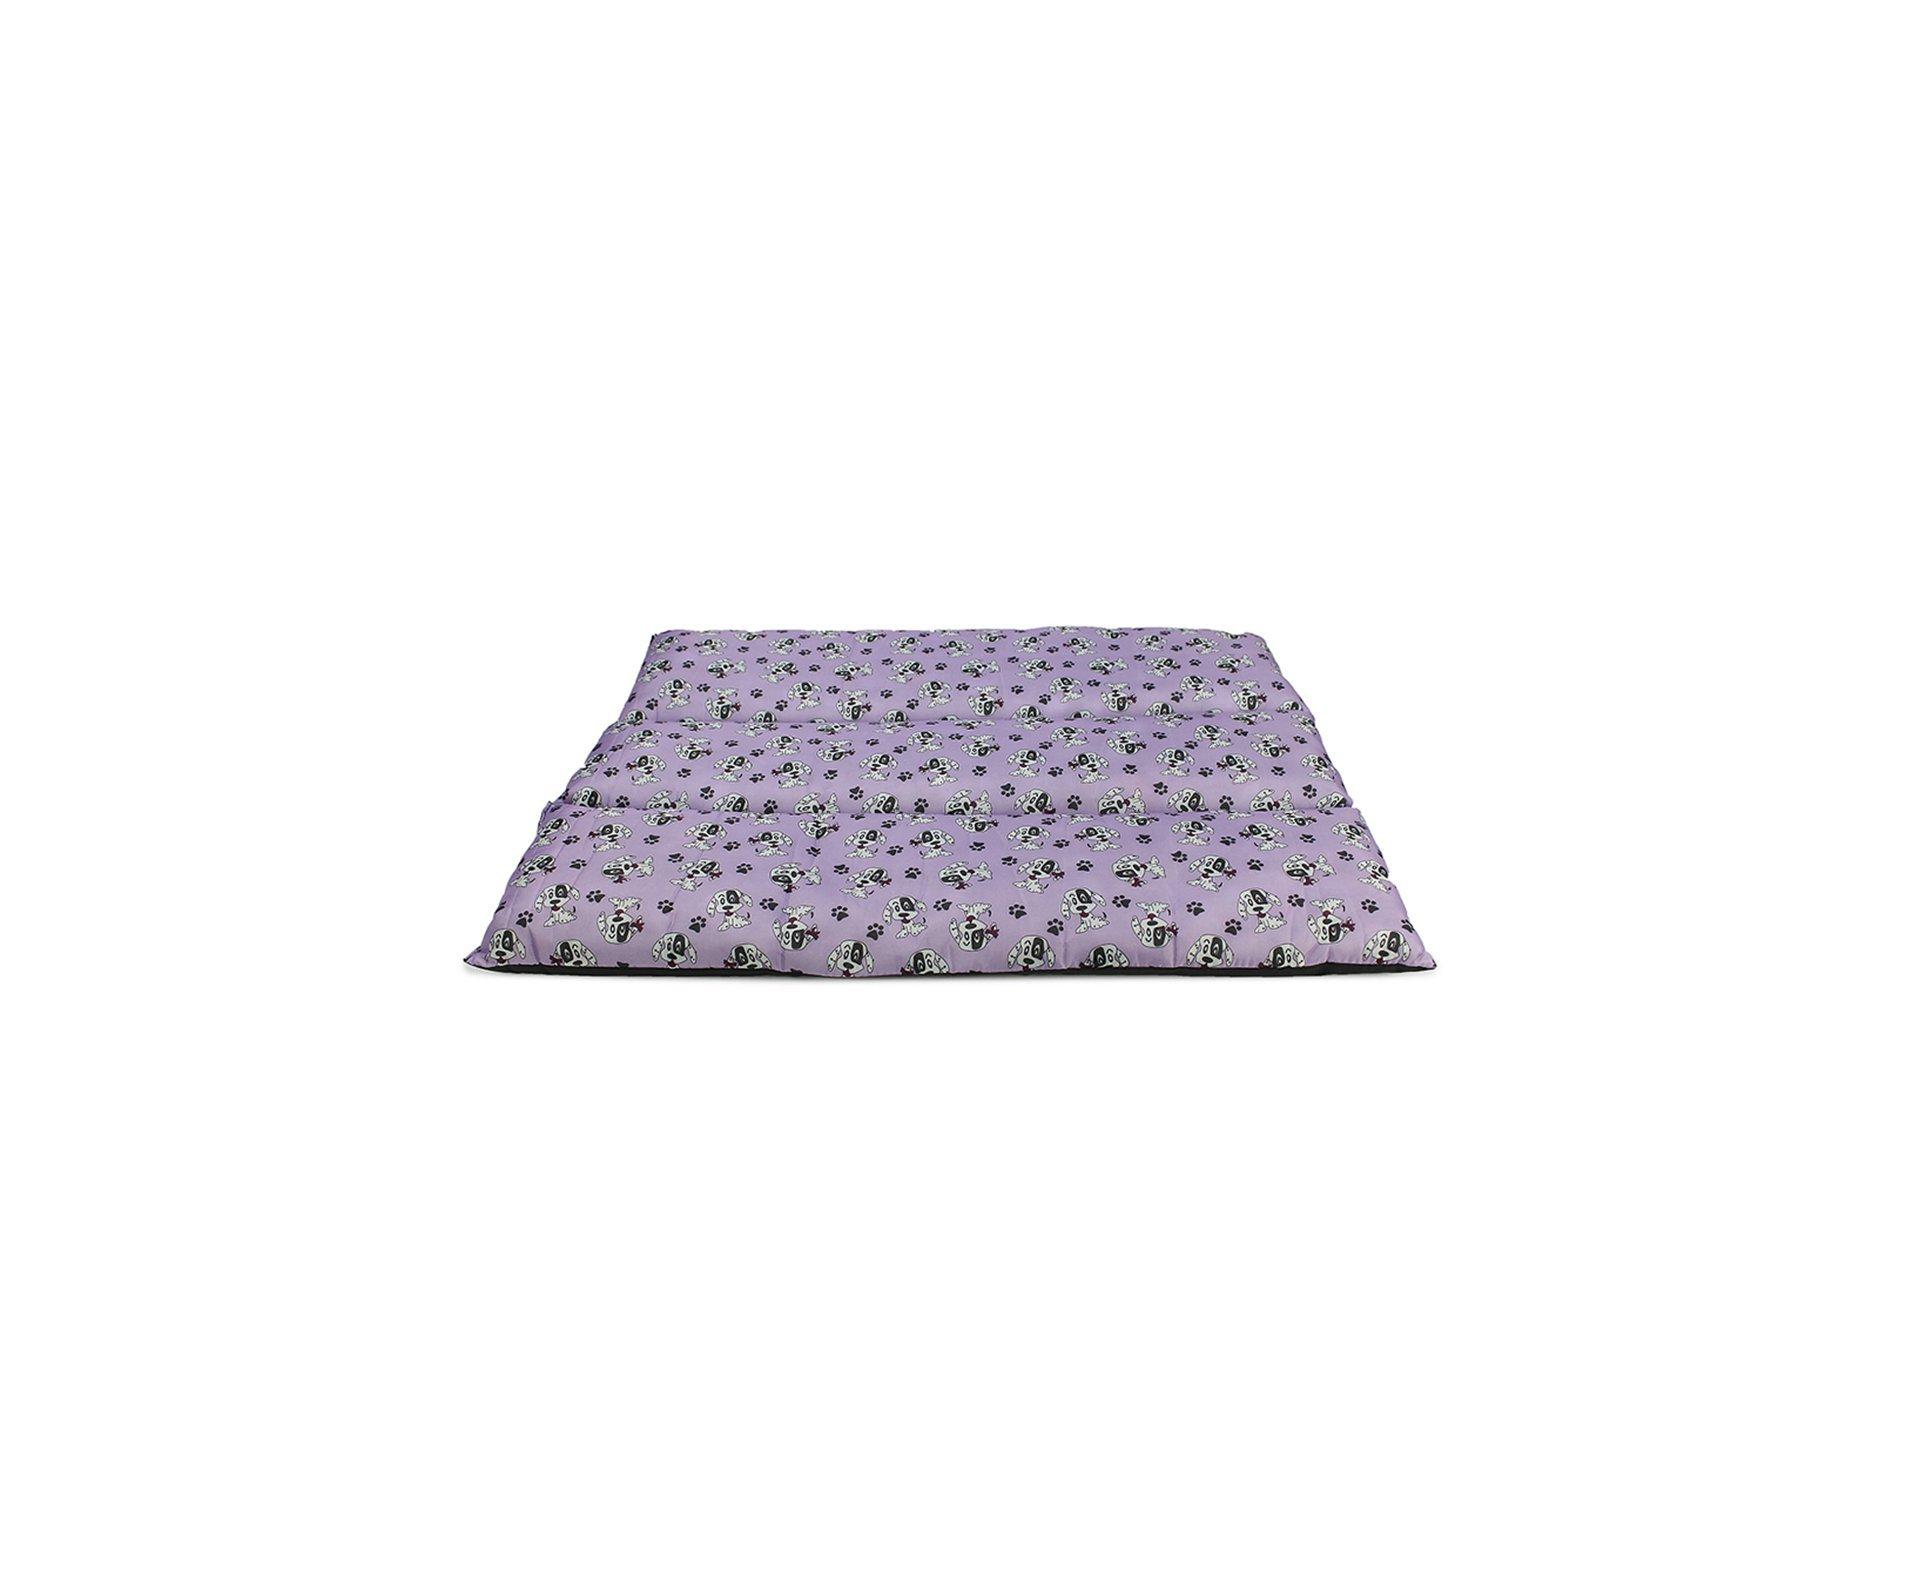 Almofada De Nylon N2 M 65x60 Lilás - Furacão